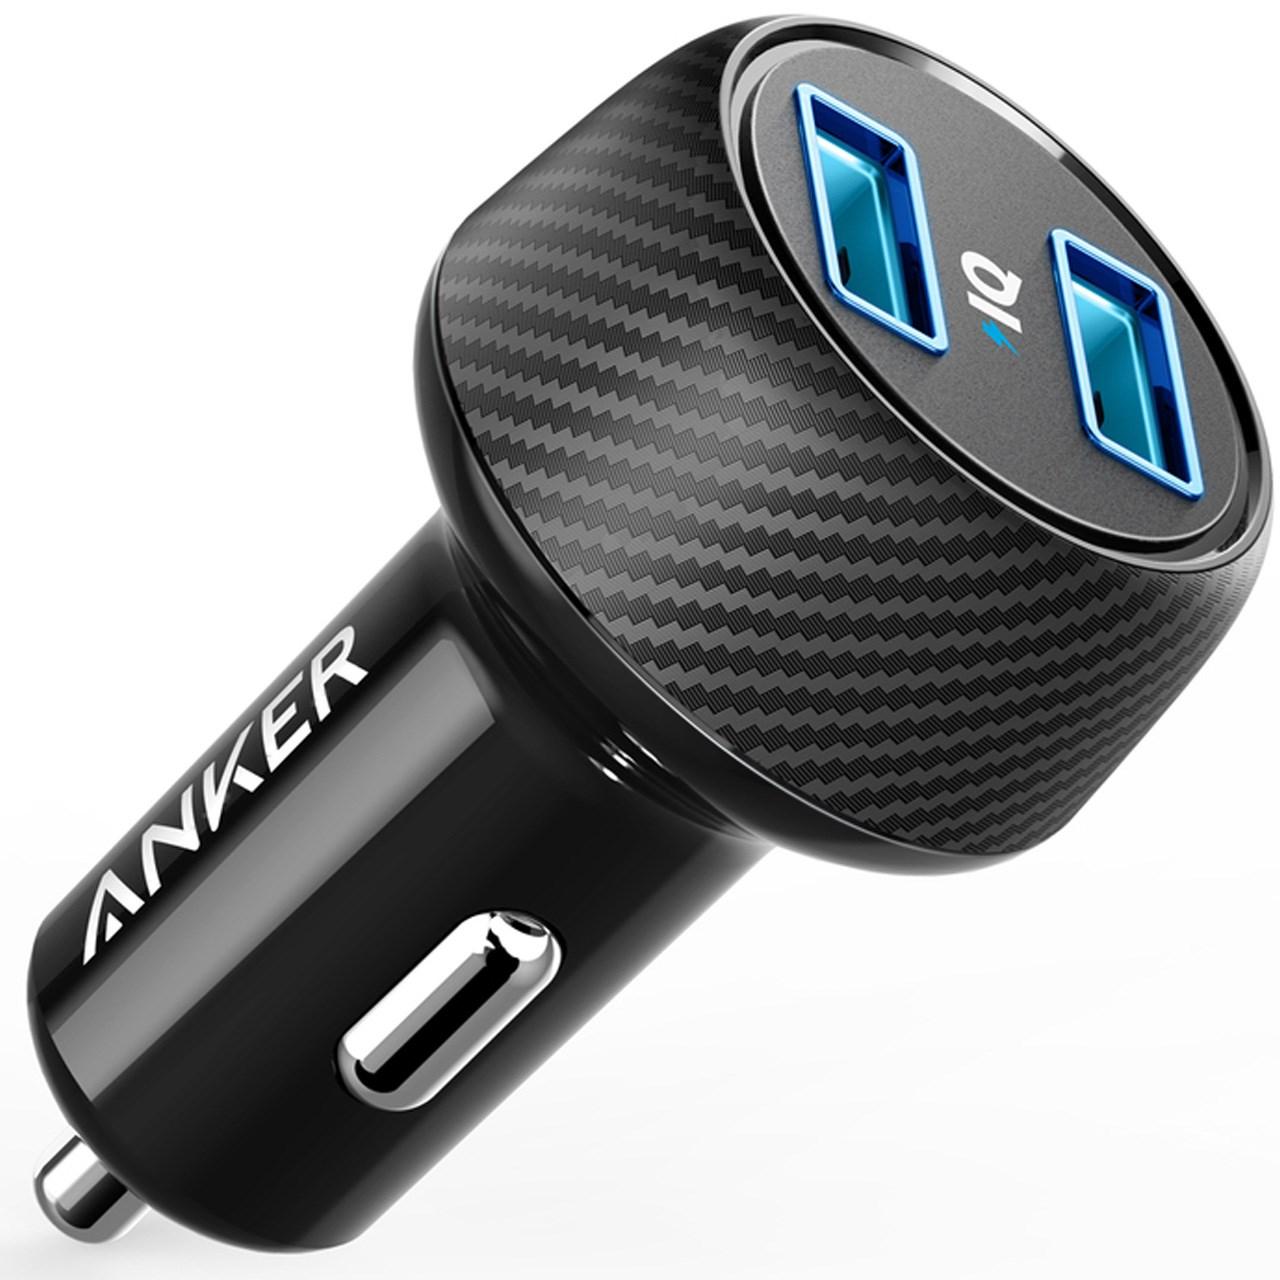 شارژر فندکی انکر مدل A2212 PowerDrive Elite 2 Ports              ( قیمت و خرید)